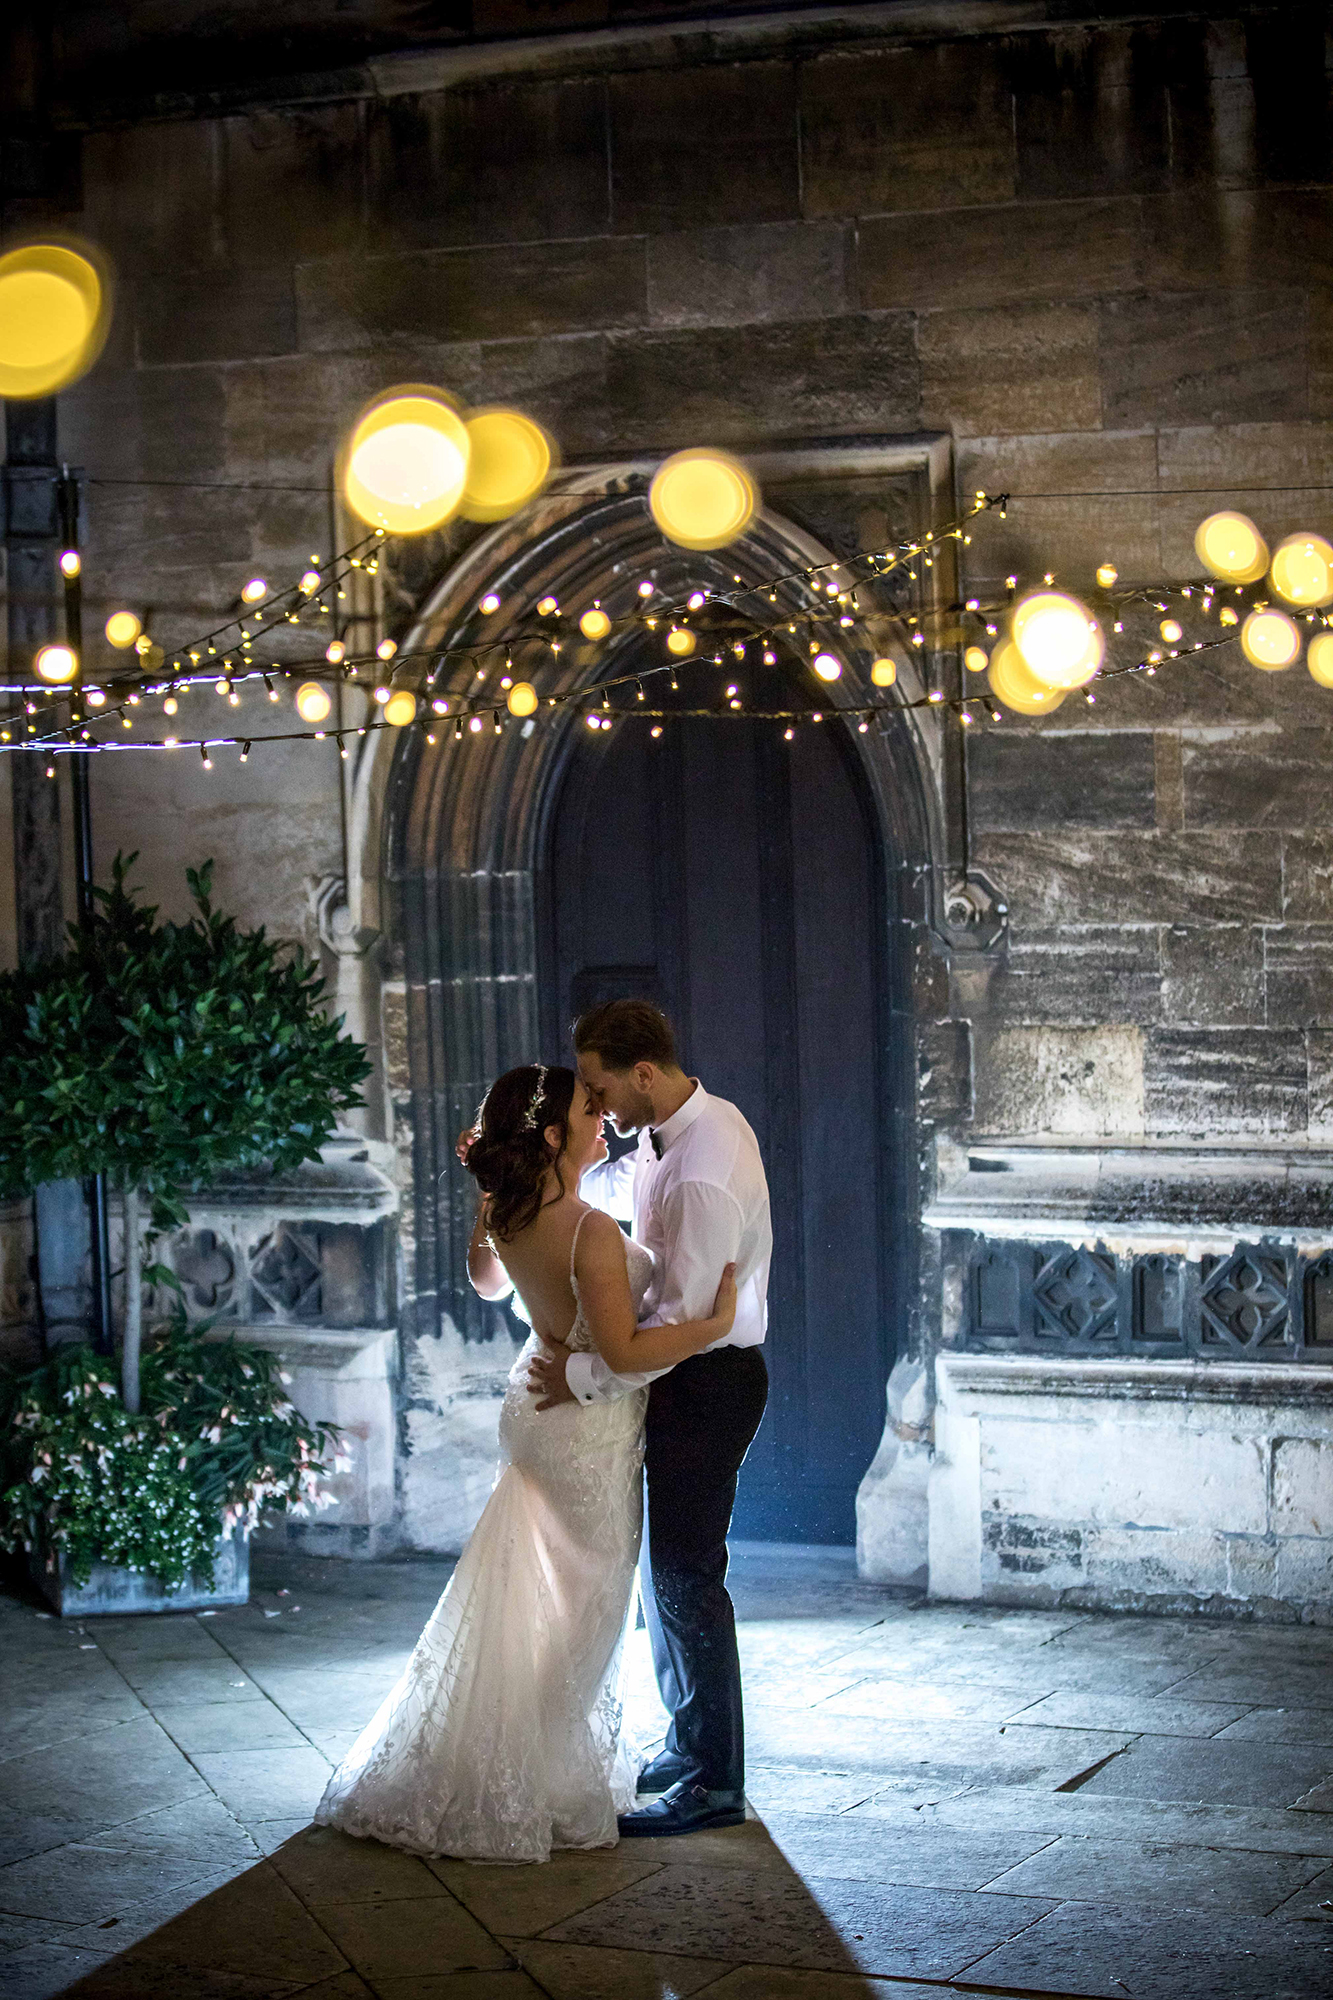 Married Couple enjoying Evening Celebrations at Hengrave Hall